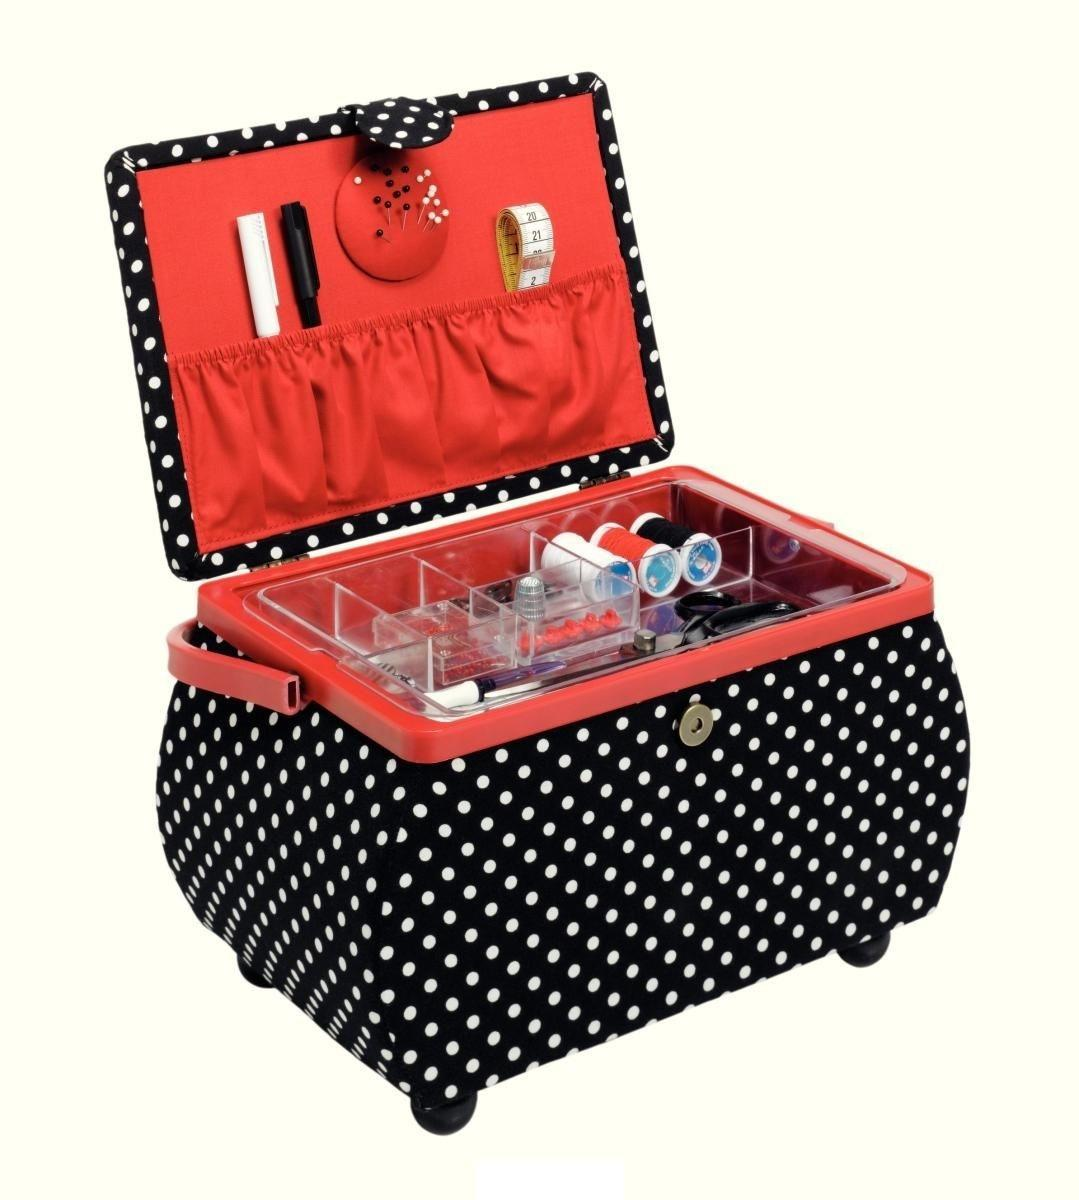 Шкатулка для рукоделия Polka dots (Горошек), цвет: черный, белый, красный, 32 х 20,5 х 20 см шкатулка для рукоделия prym сафари 23 х 23 х 14 см